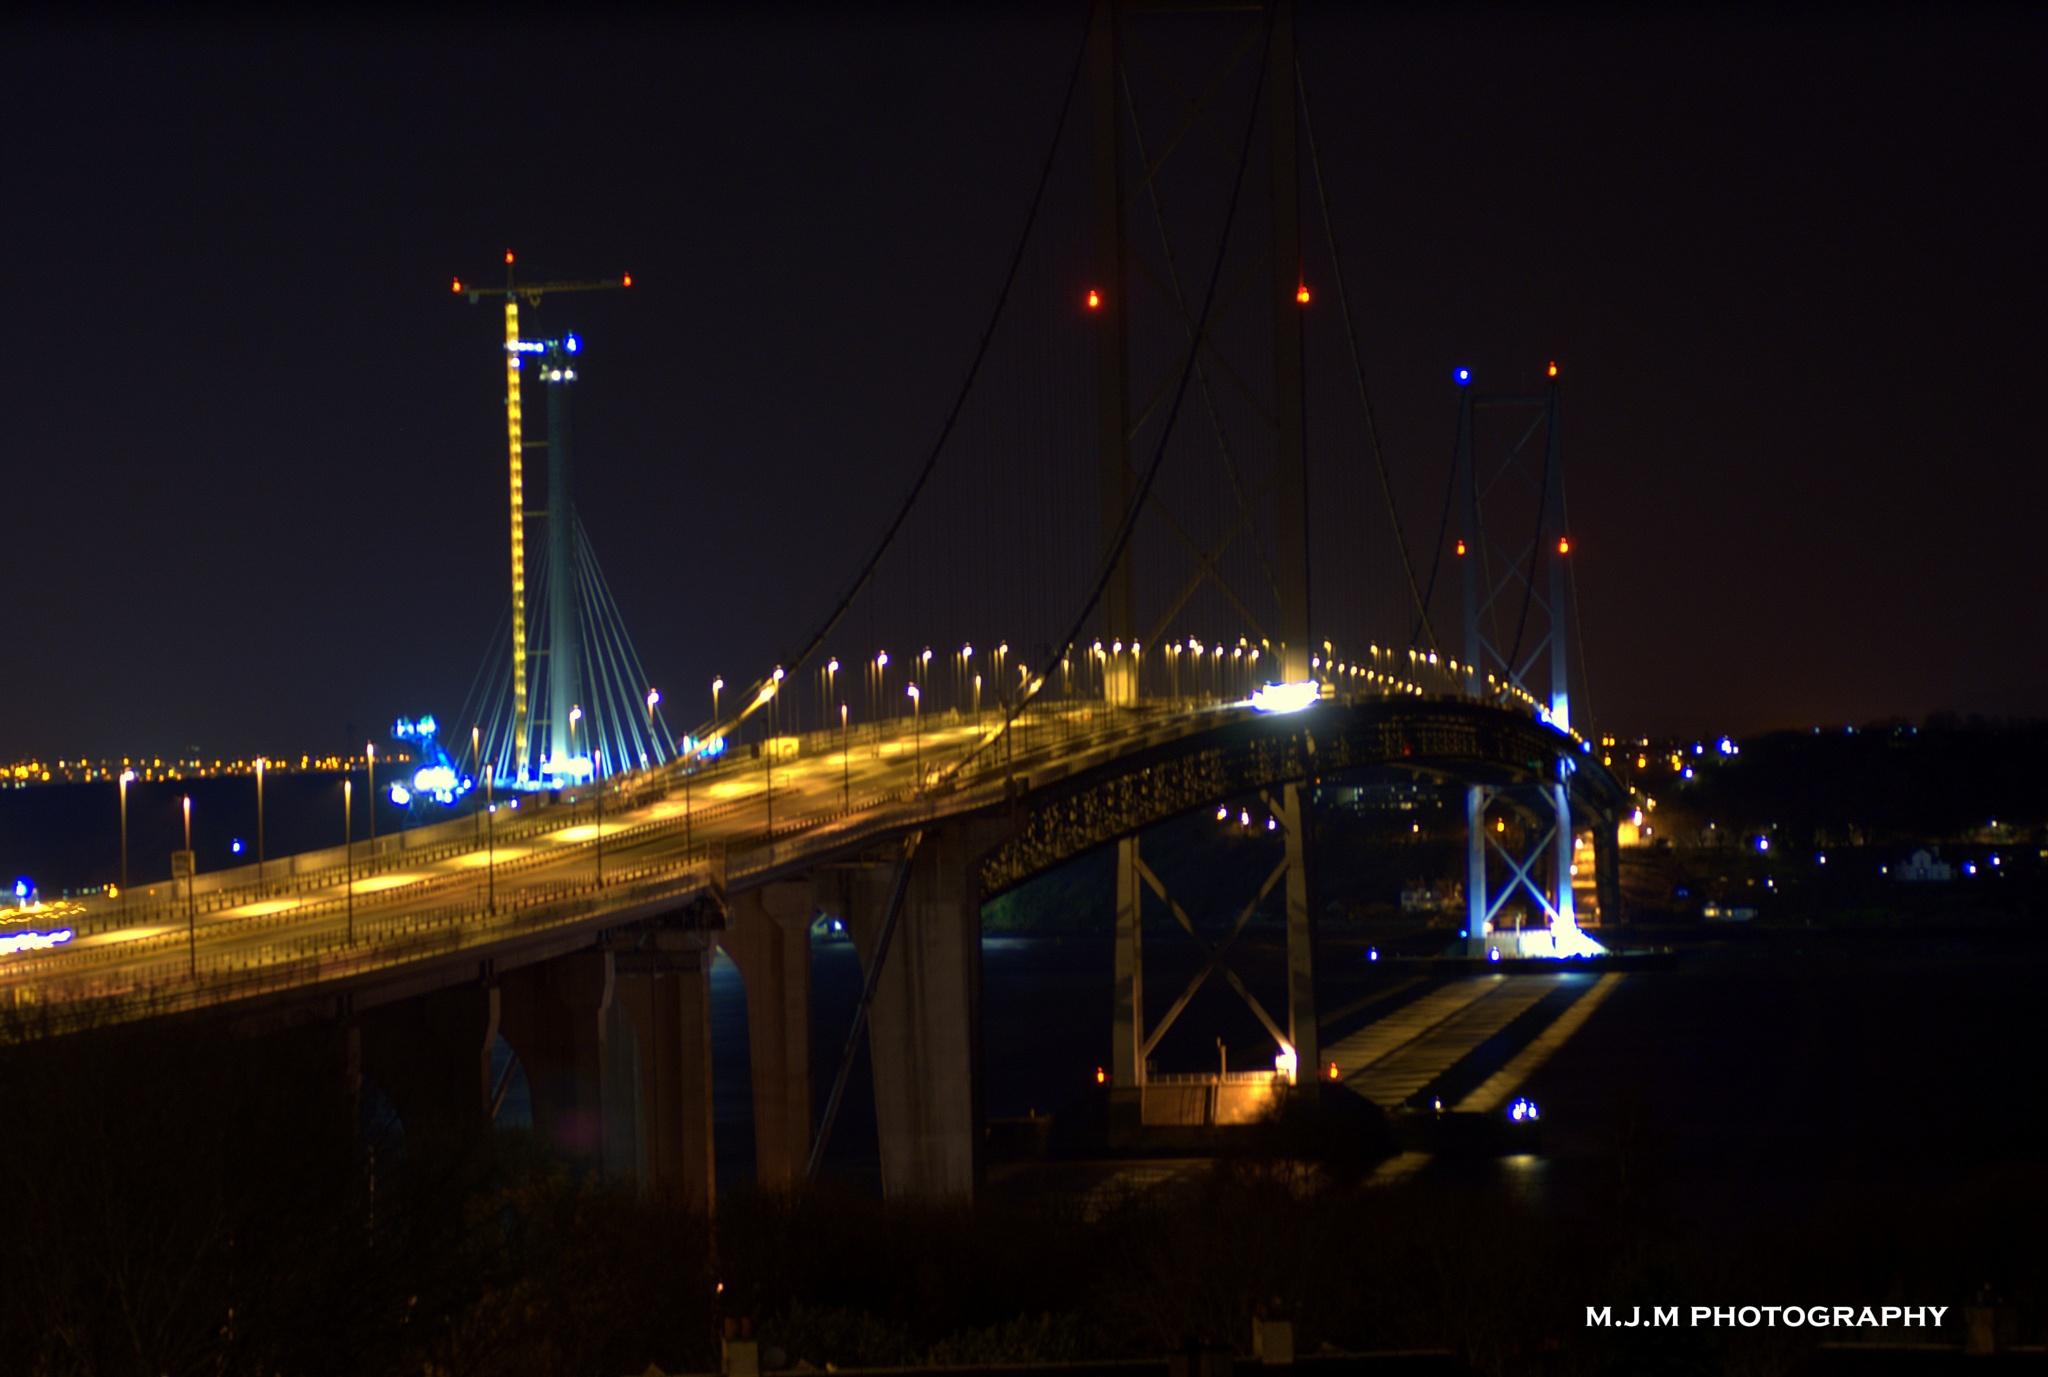 BROKEN FORTH ROAD BRIDGE by Mark McDonald